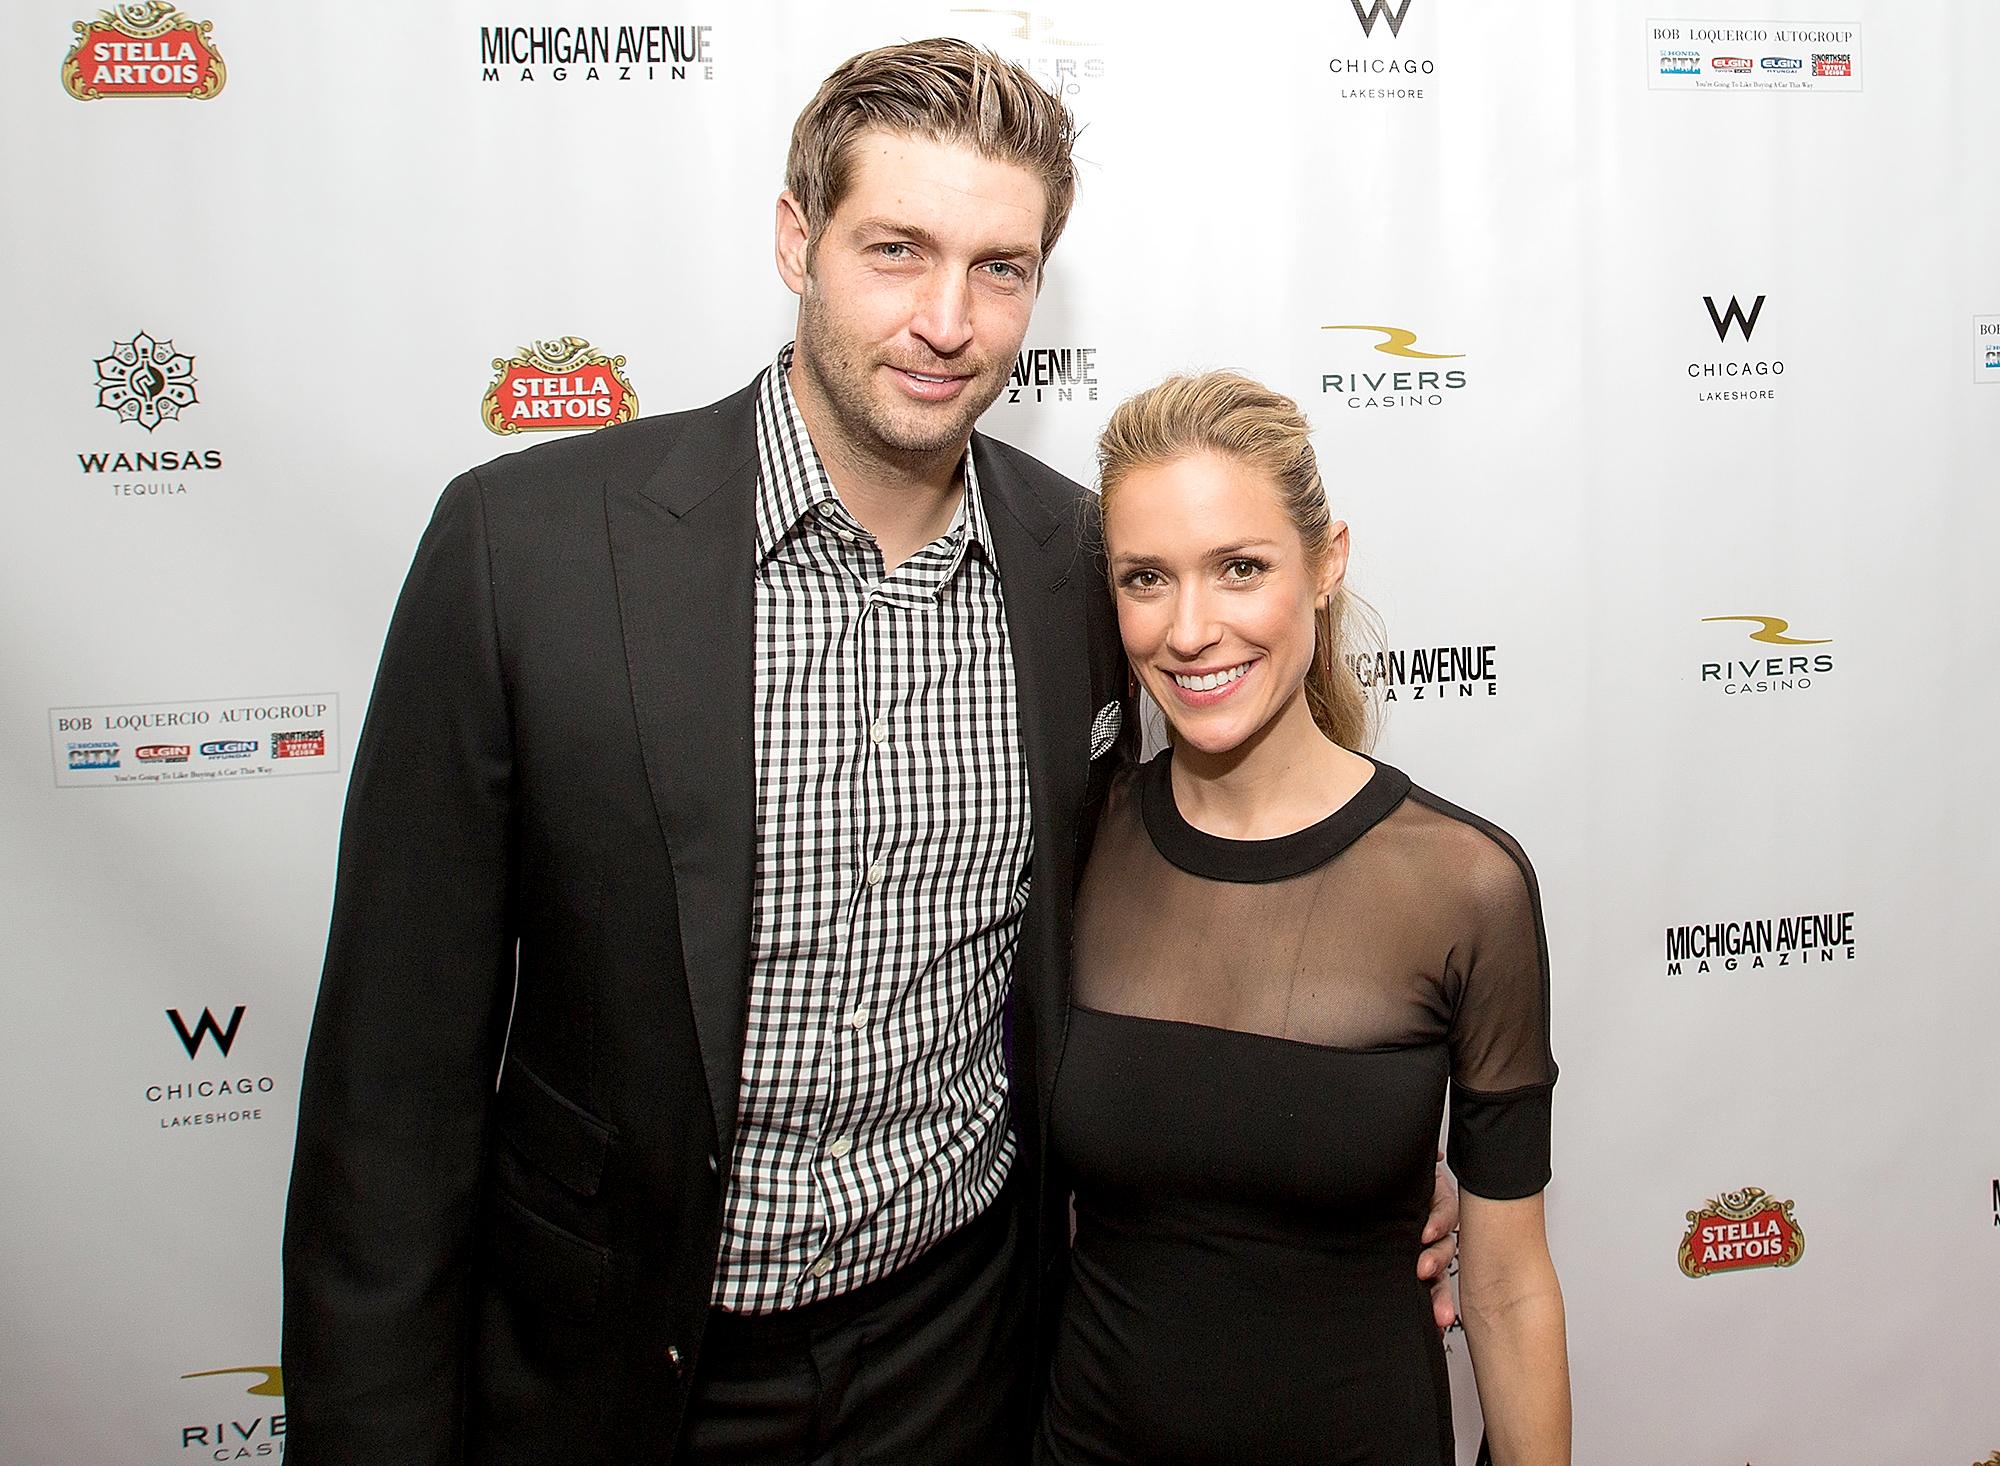 Jay-Cutler-and-Kristin-Cavallari-finances - Jay Cutler and Kristin Cavallari